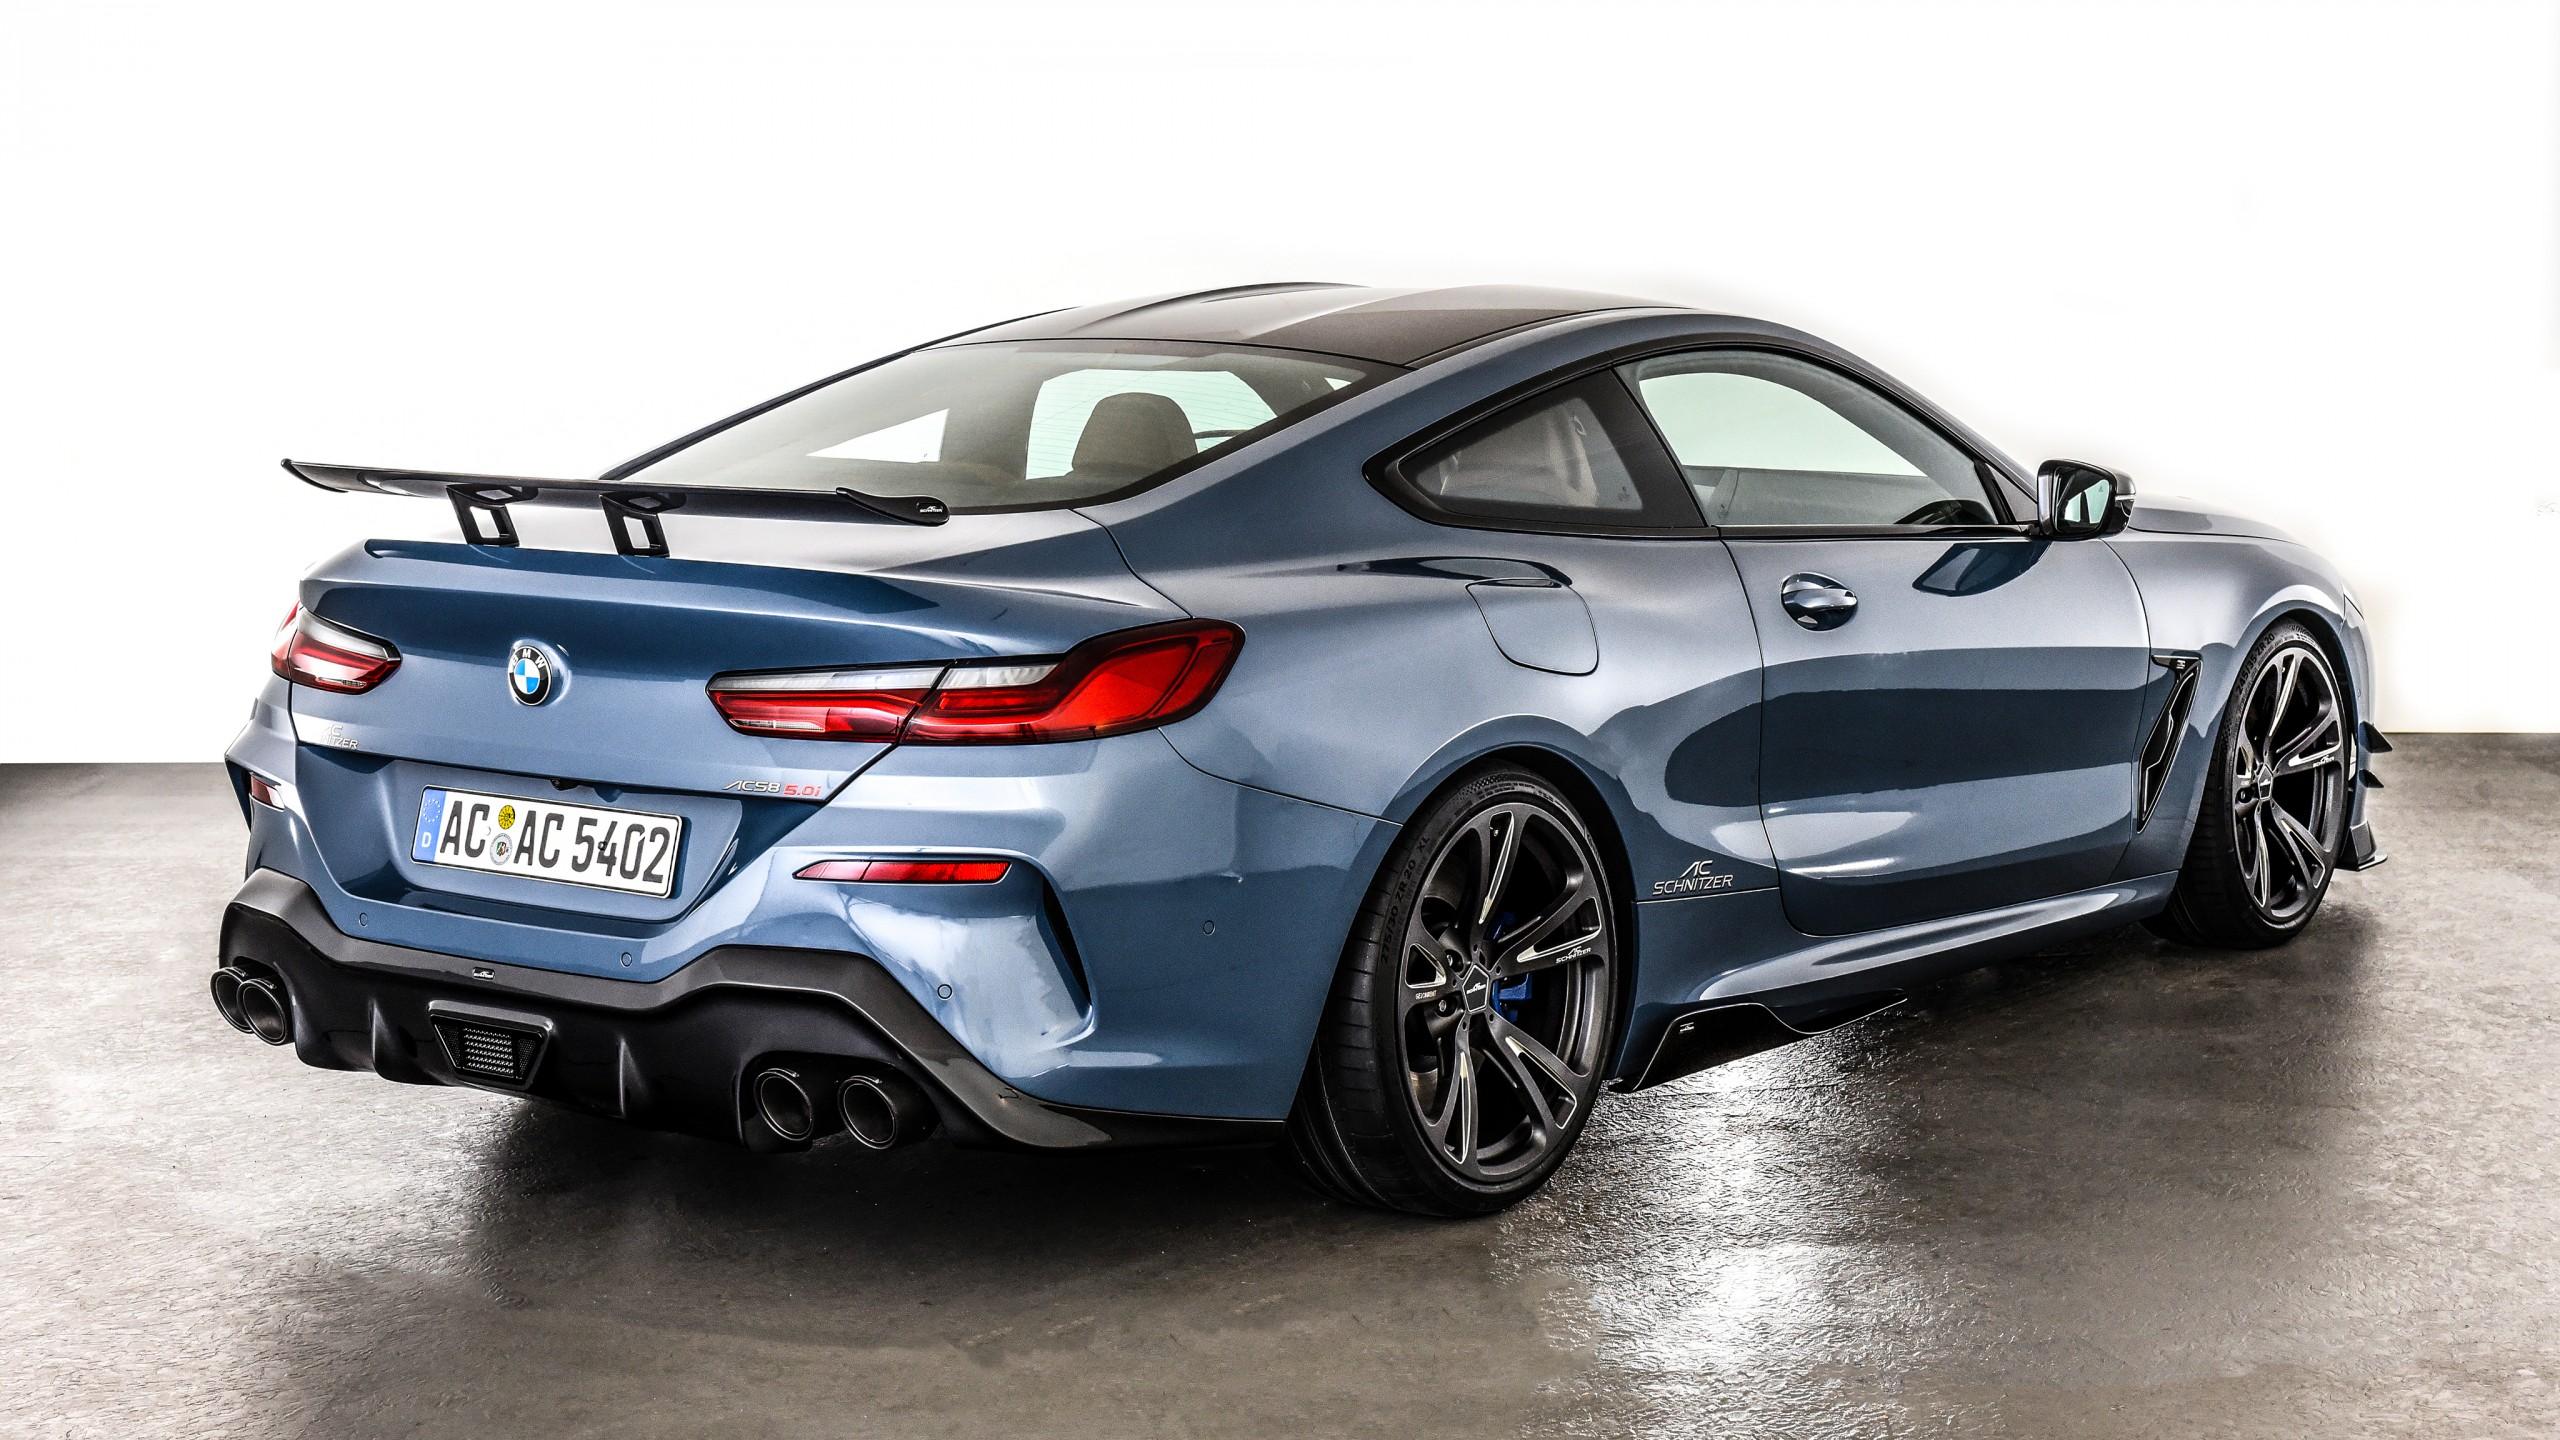 Jaguar F Type Coupe >> Wallpaper AC Schnitzer BMW 8-Series, 2018 Cars, 4K, Cars & Bikes #20971